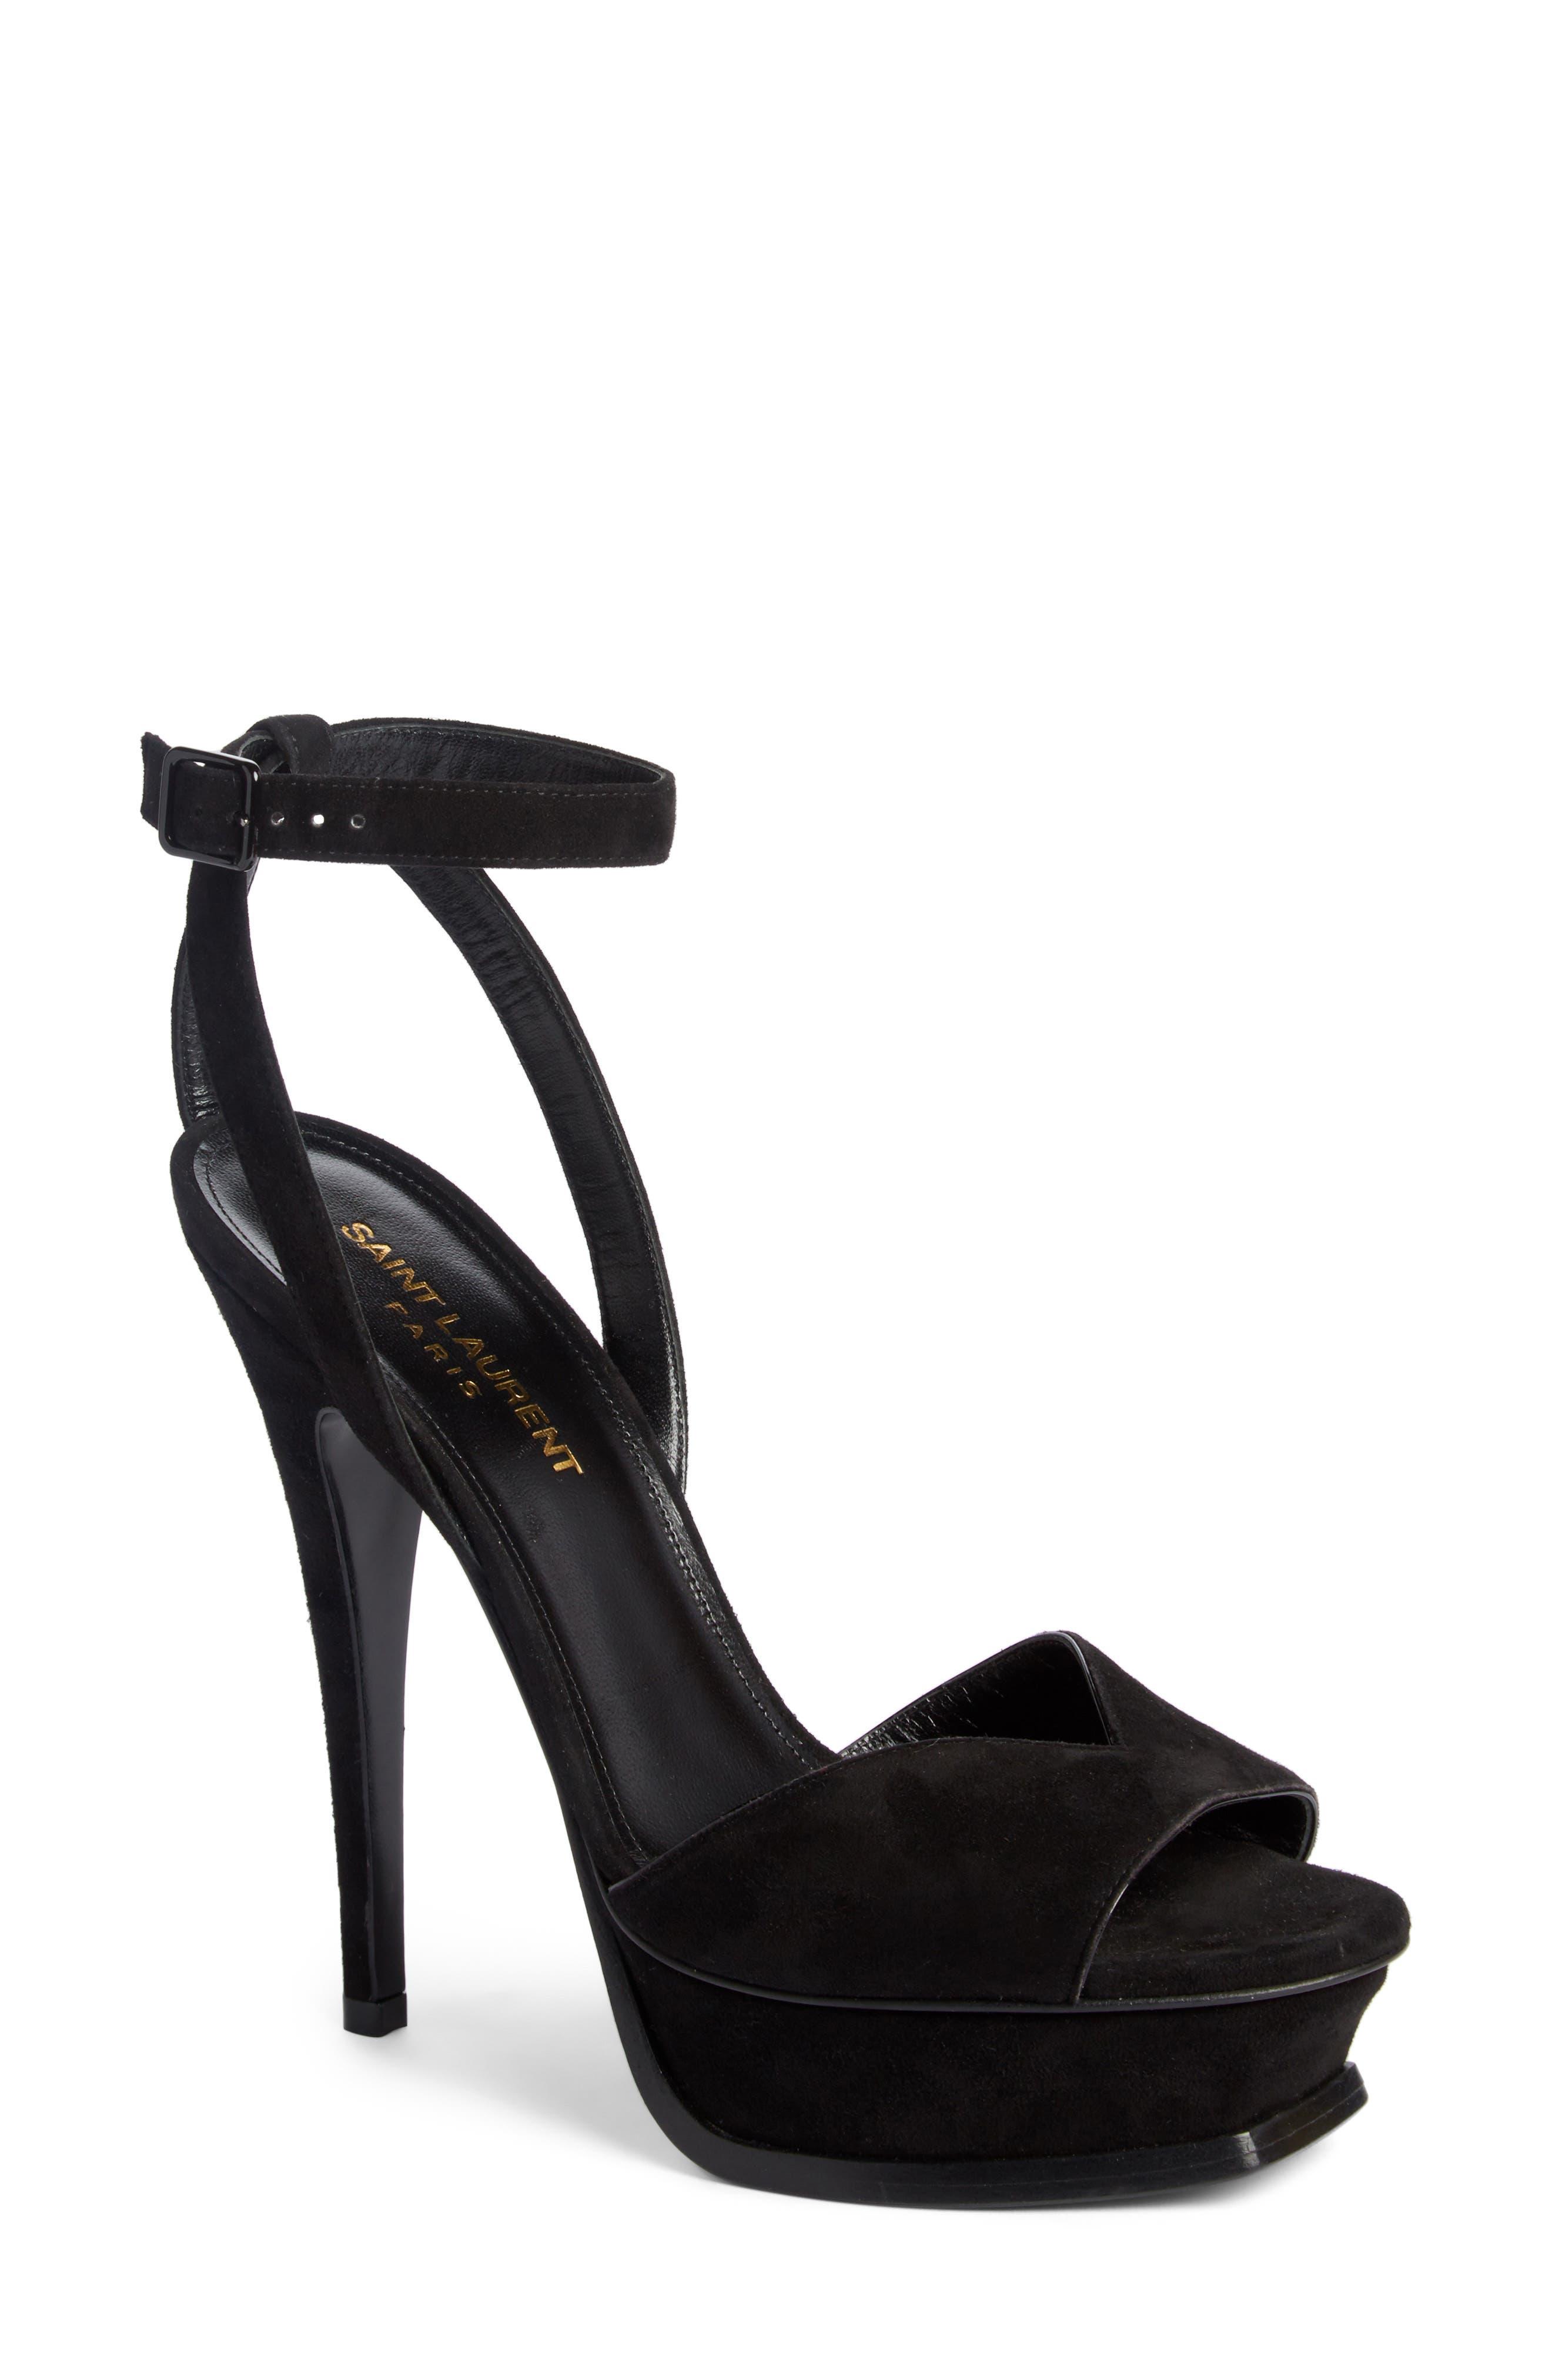 Alternate Image 1 Selected - Saint Laurent Tribute Platform Sandal (Women)